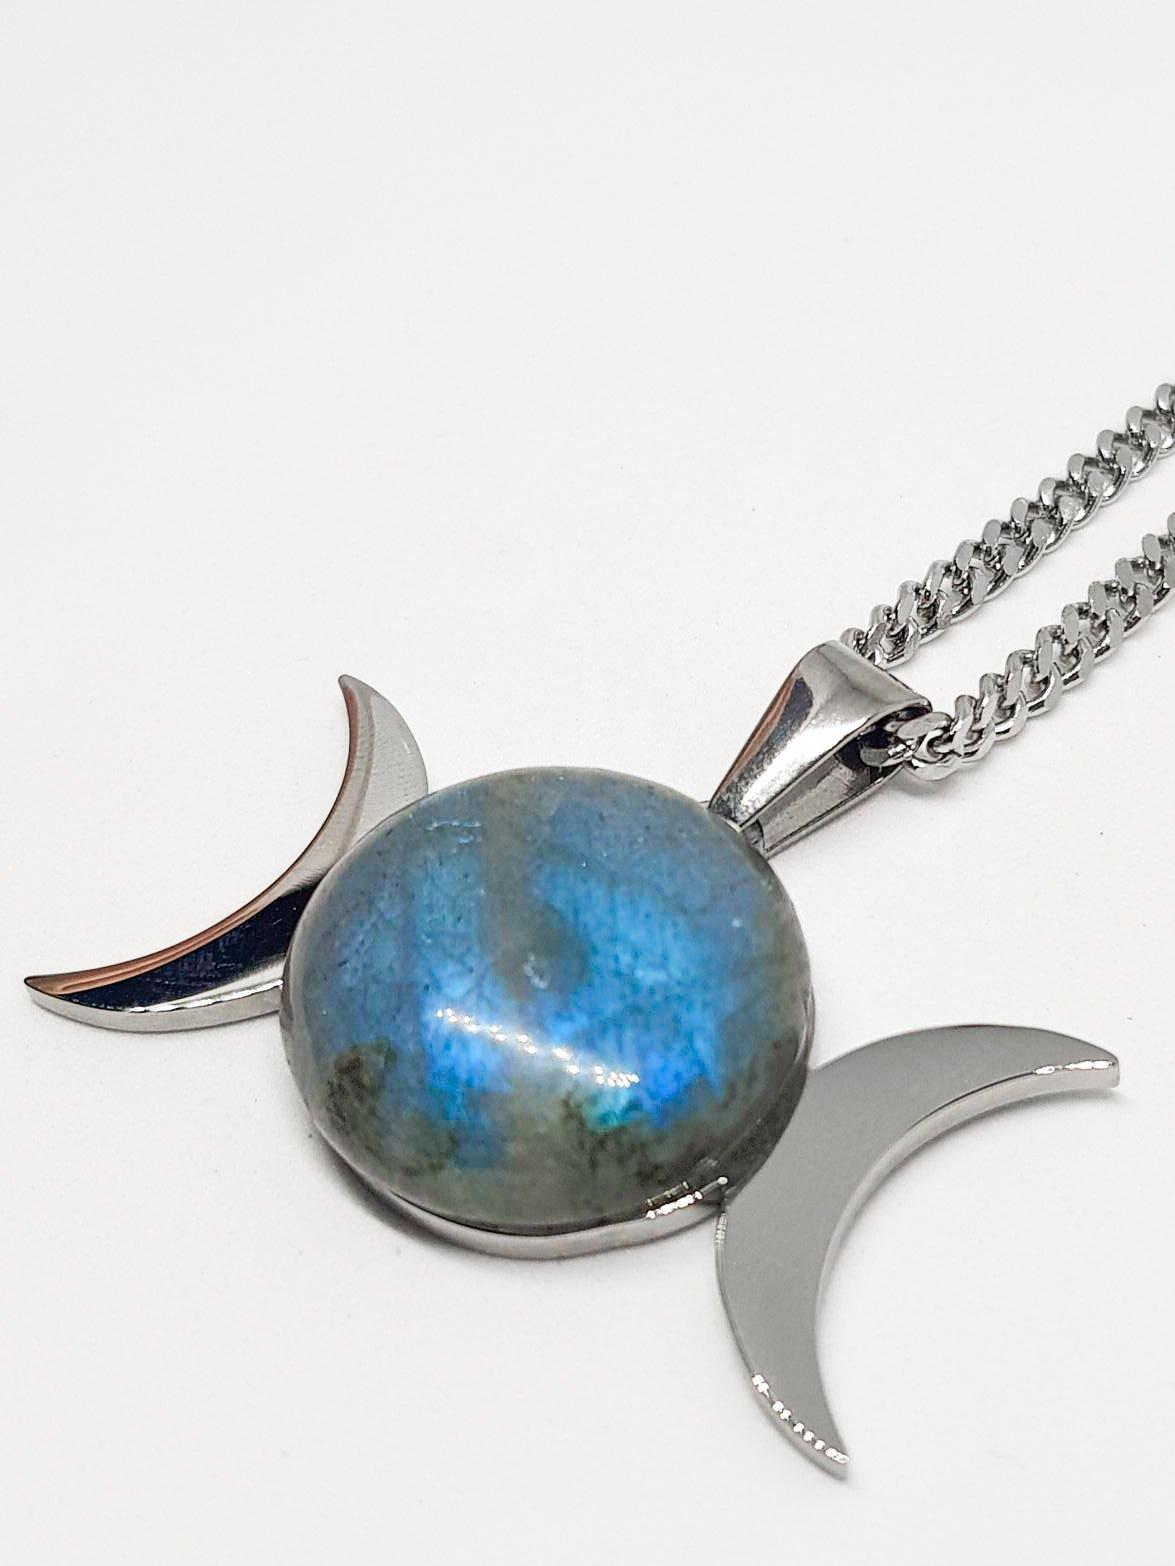 Labradorite Triple Moon Goddess - Stainless Steel Silver and Labradorite / Spectrolite Stone